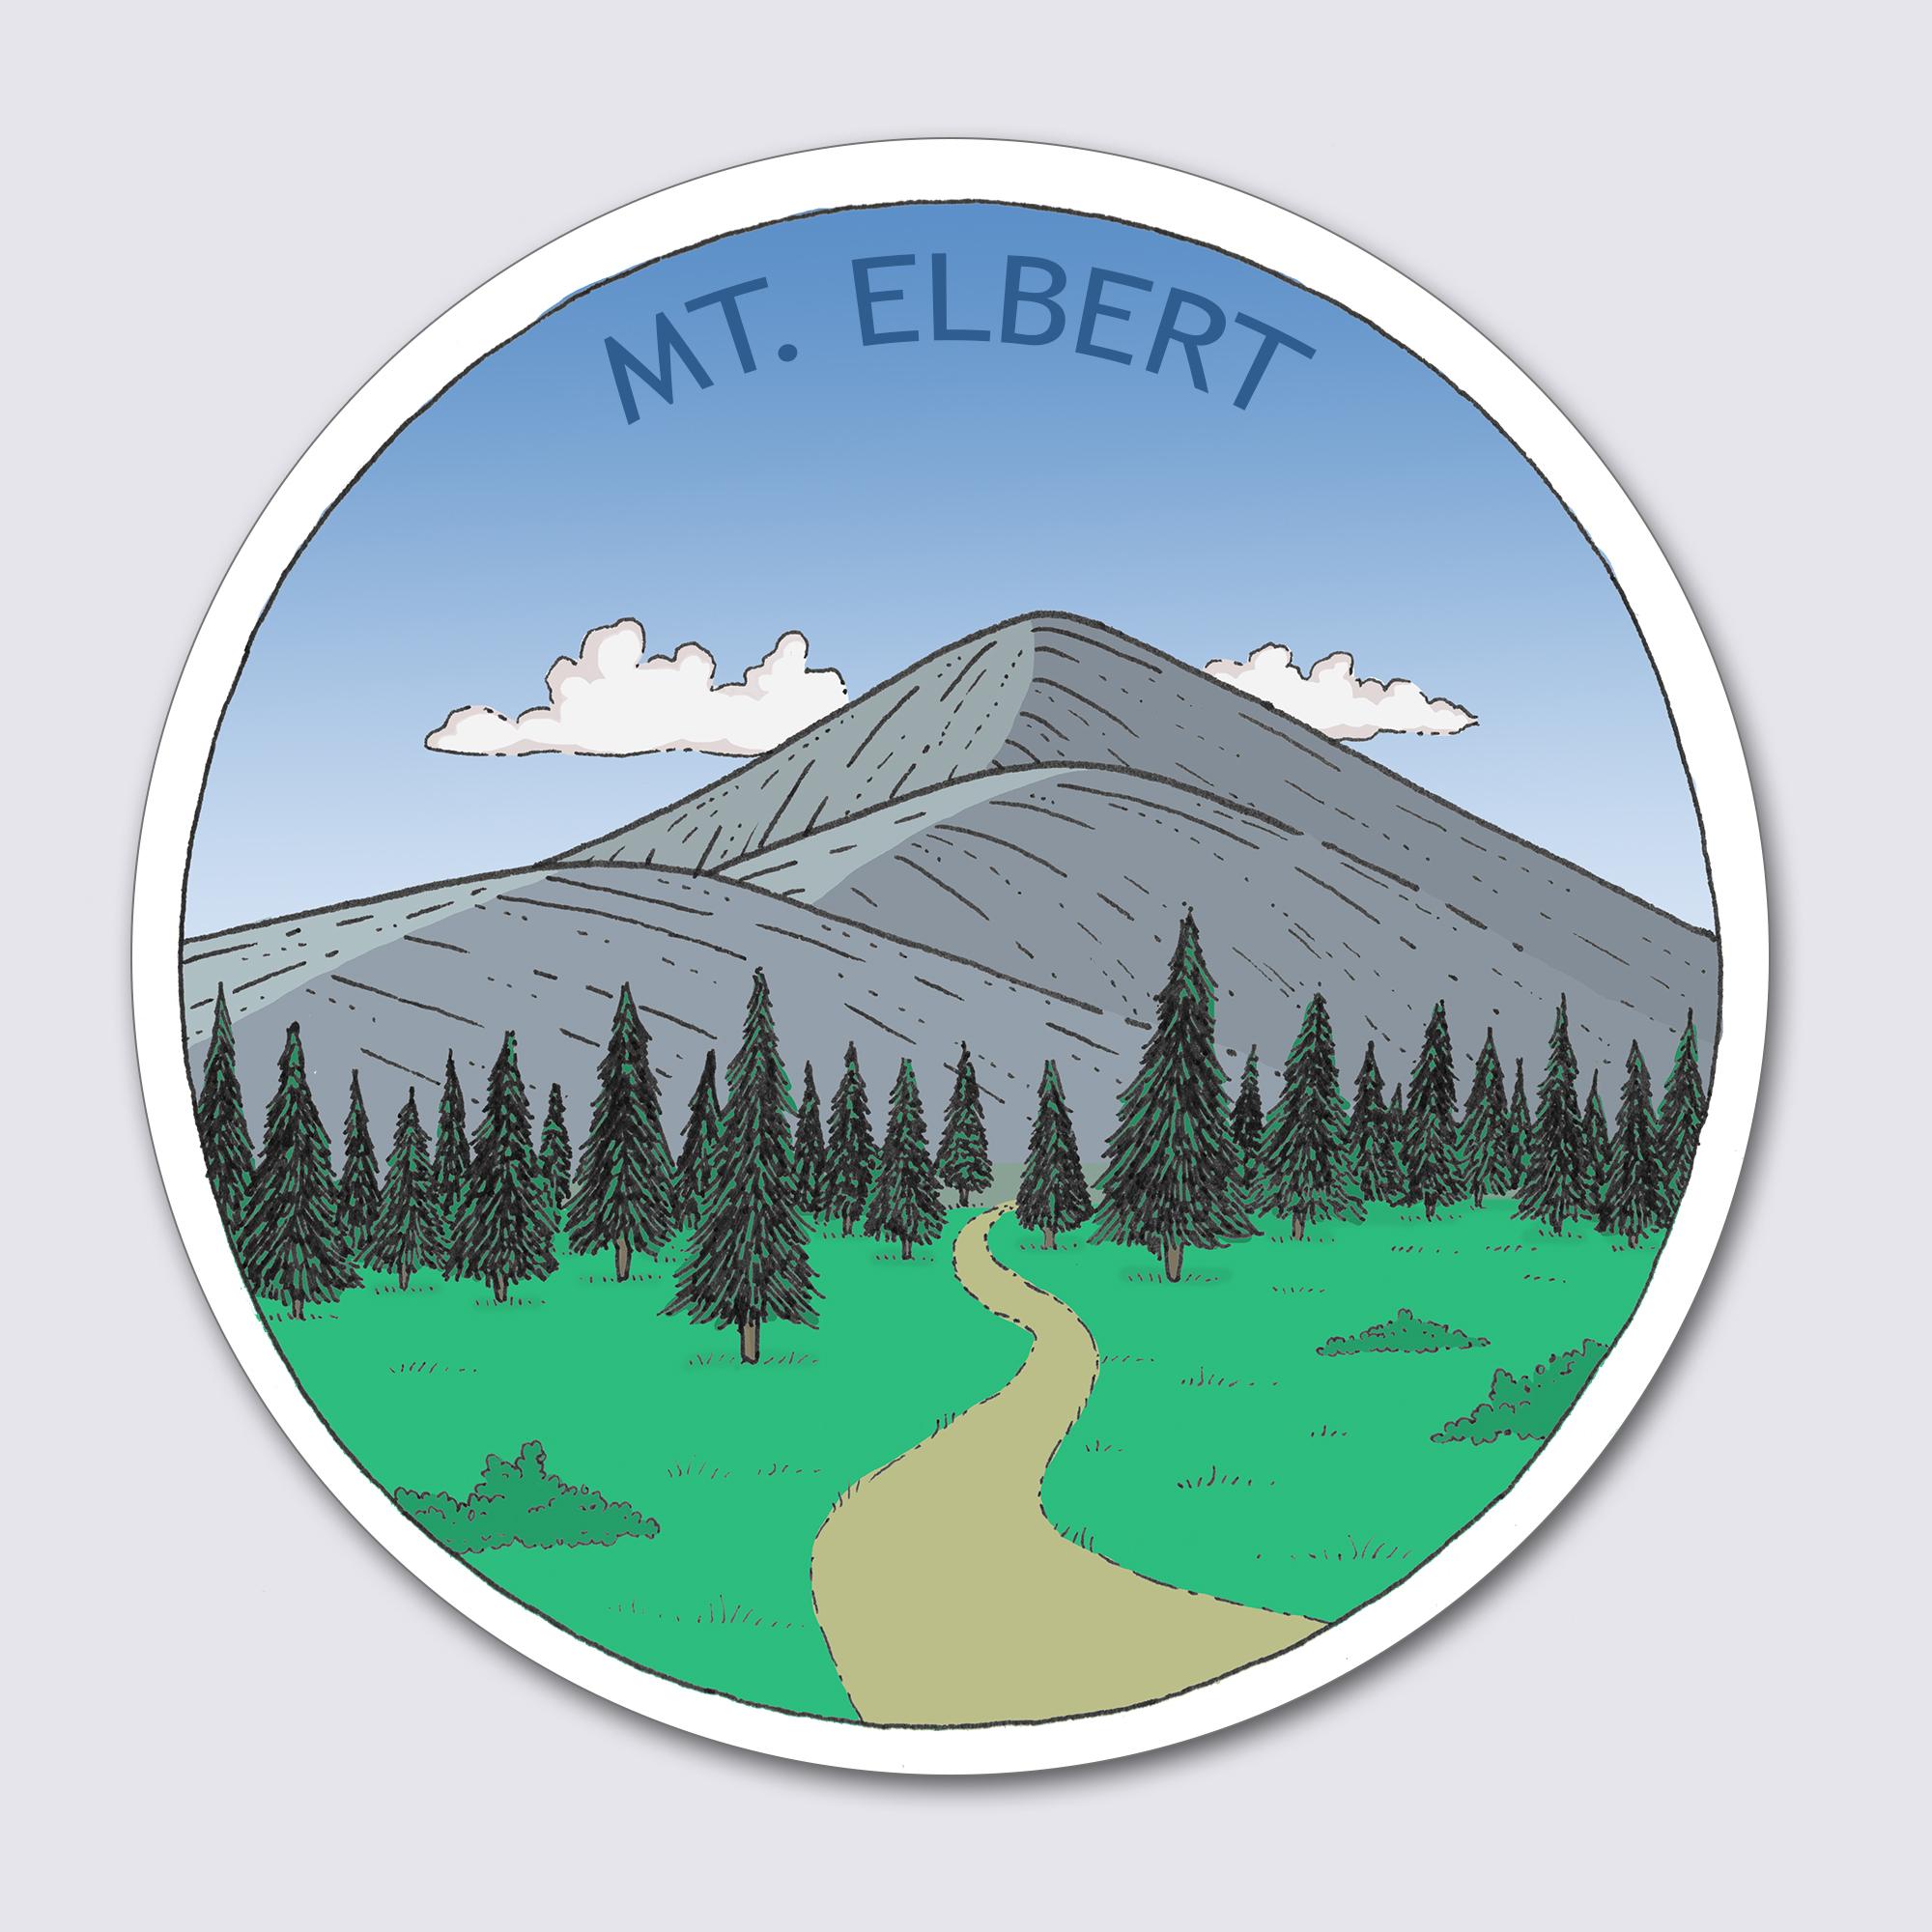 eLBERT.jpg